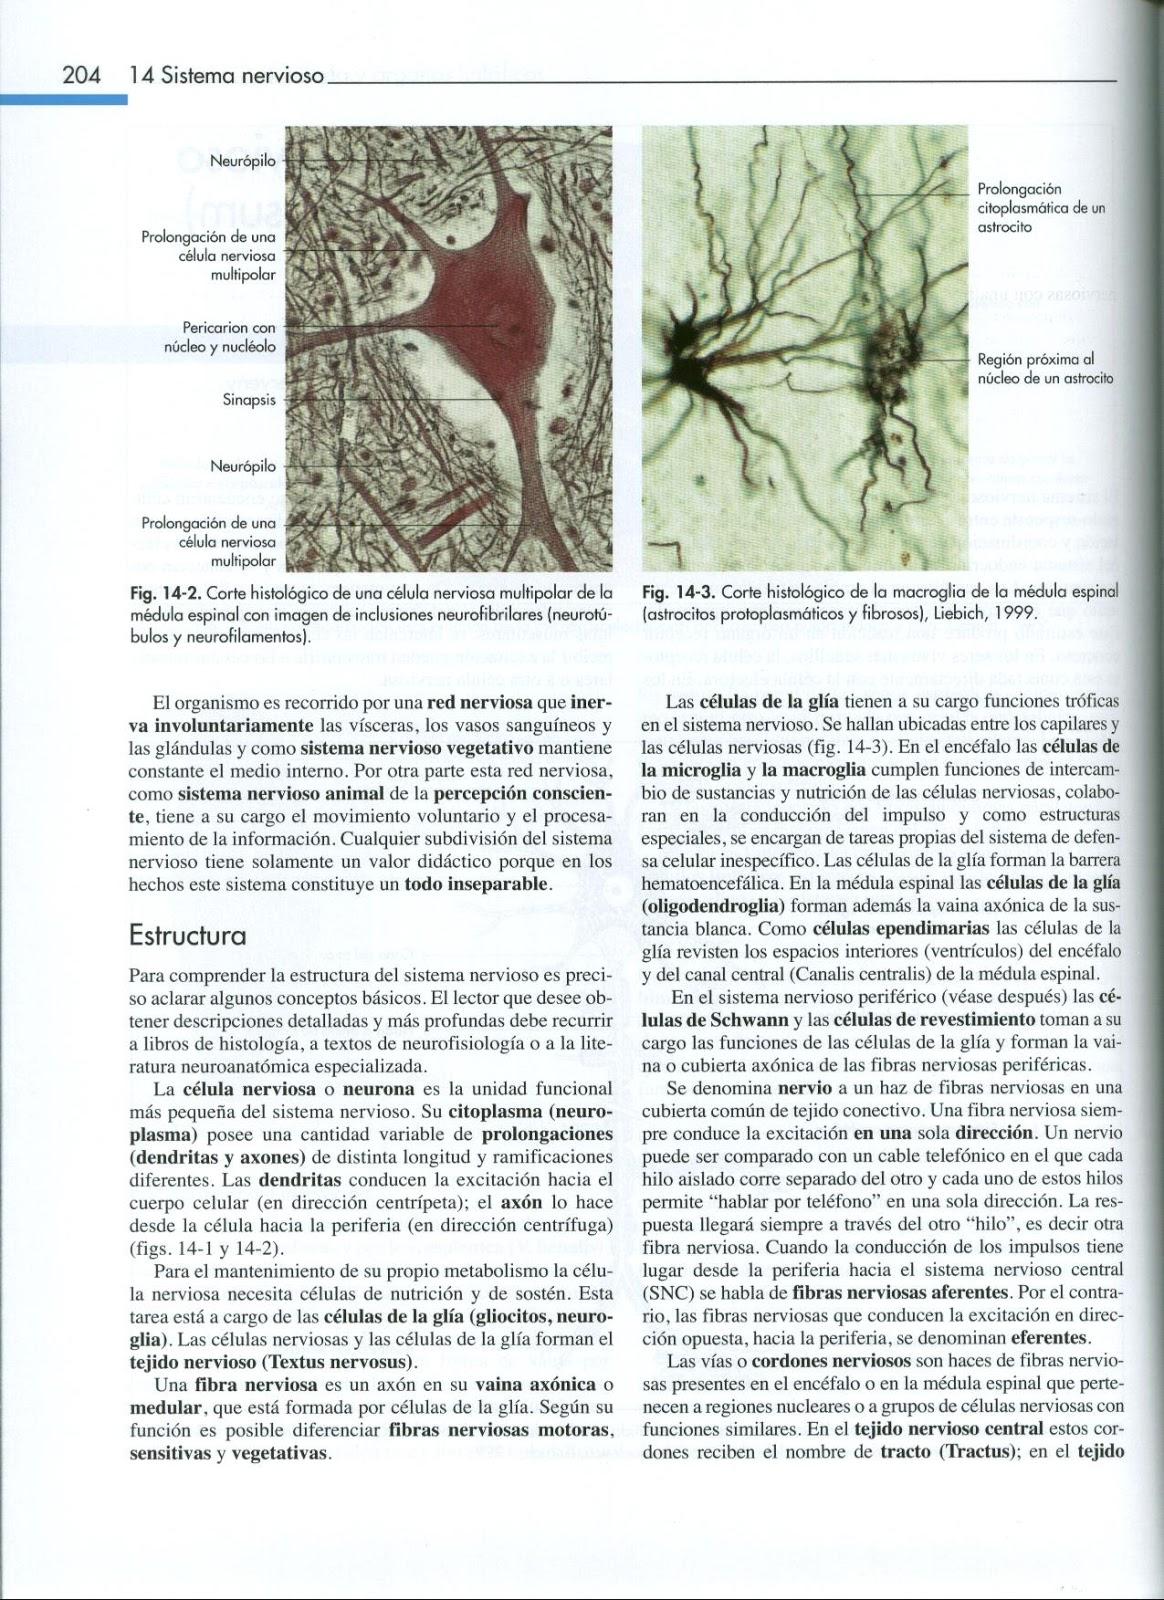 Anatomia Veterinaria: Sistema Nervioso Central Konig